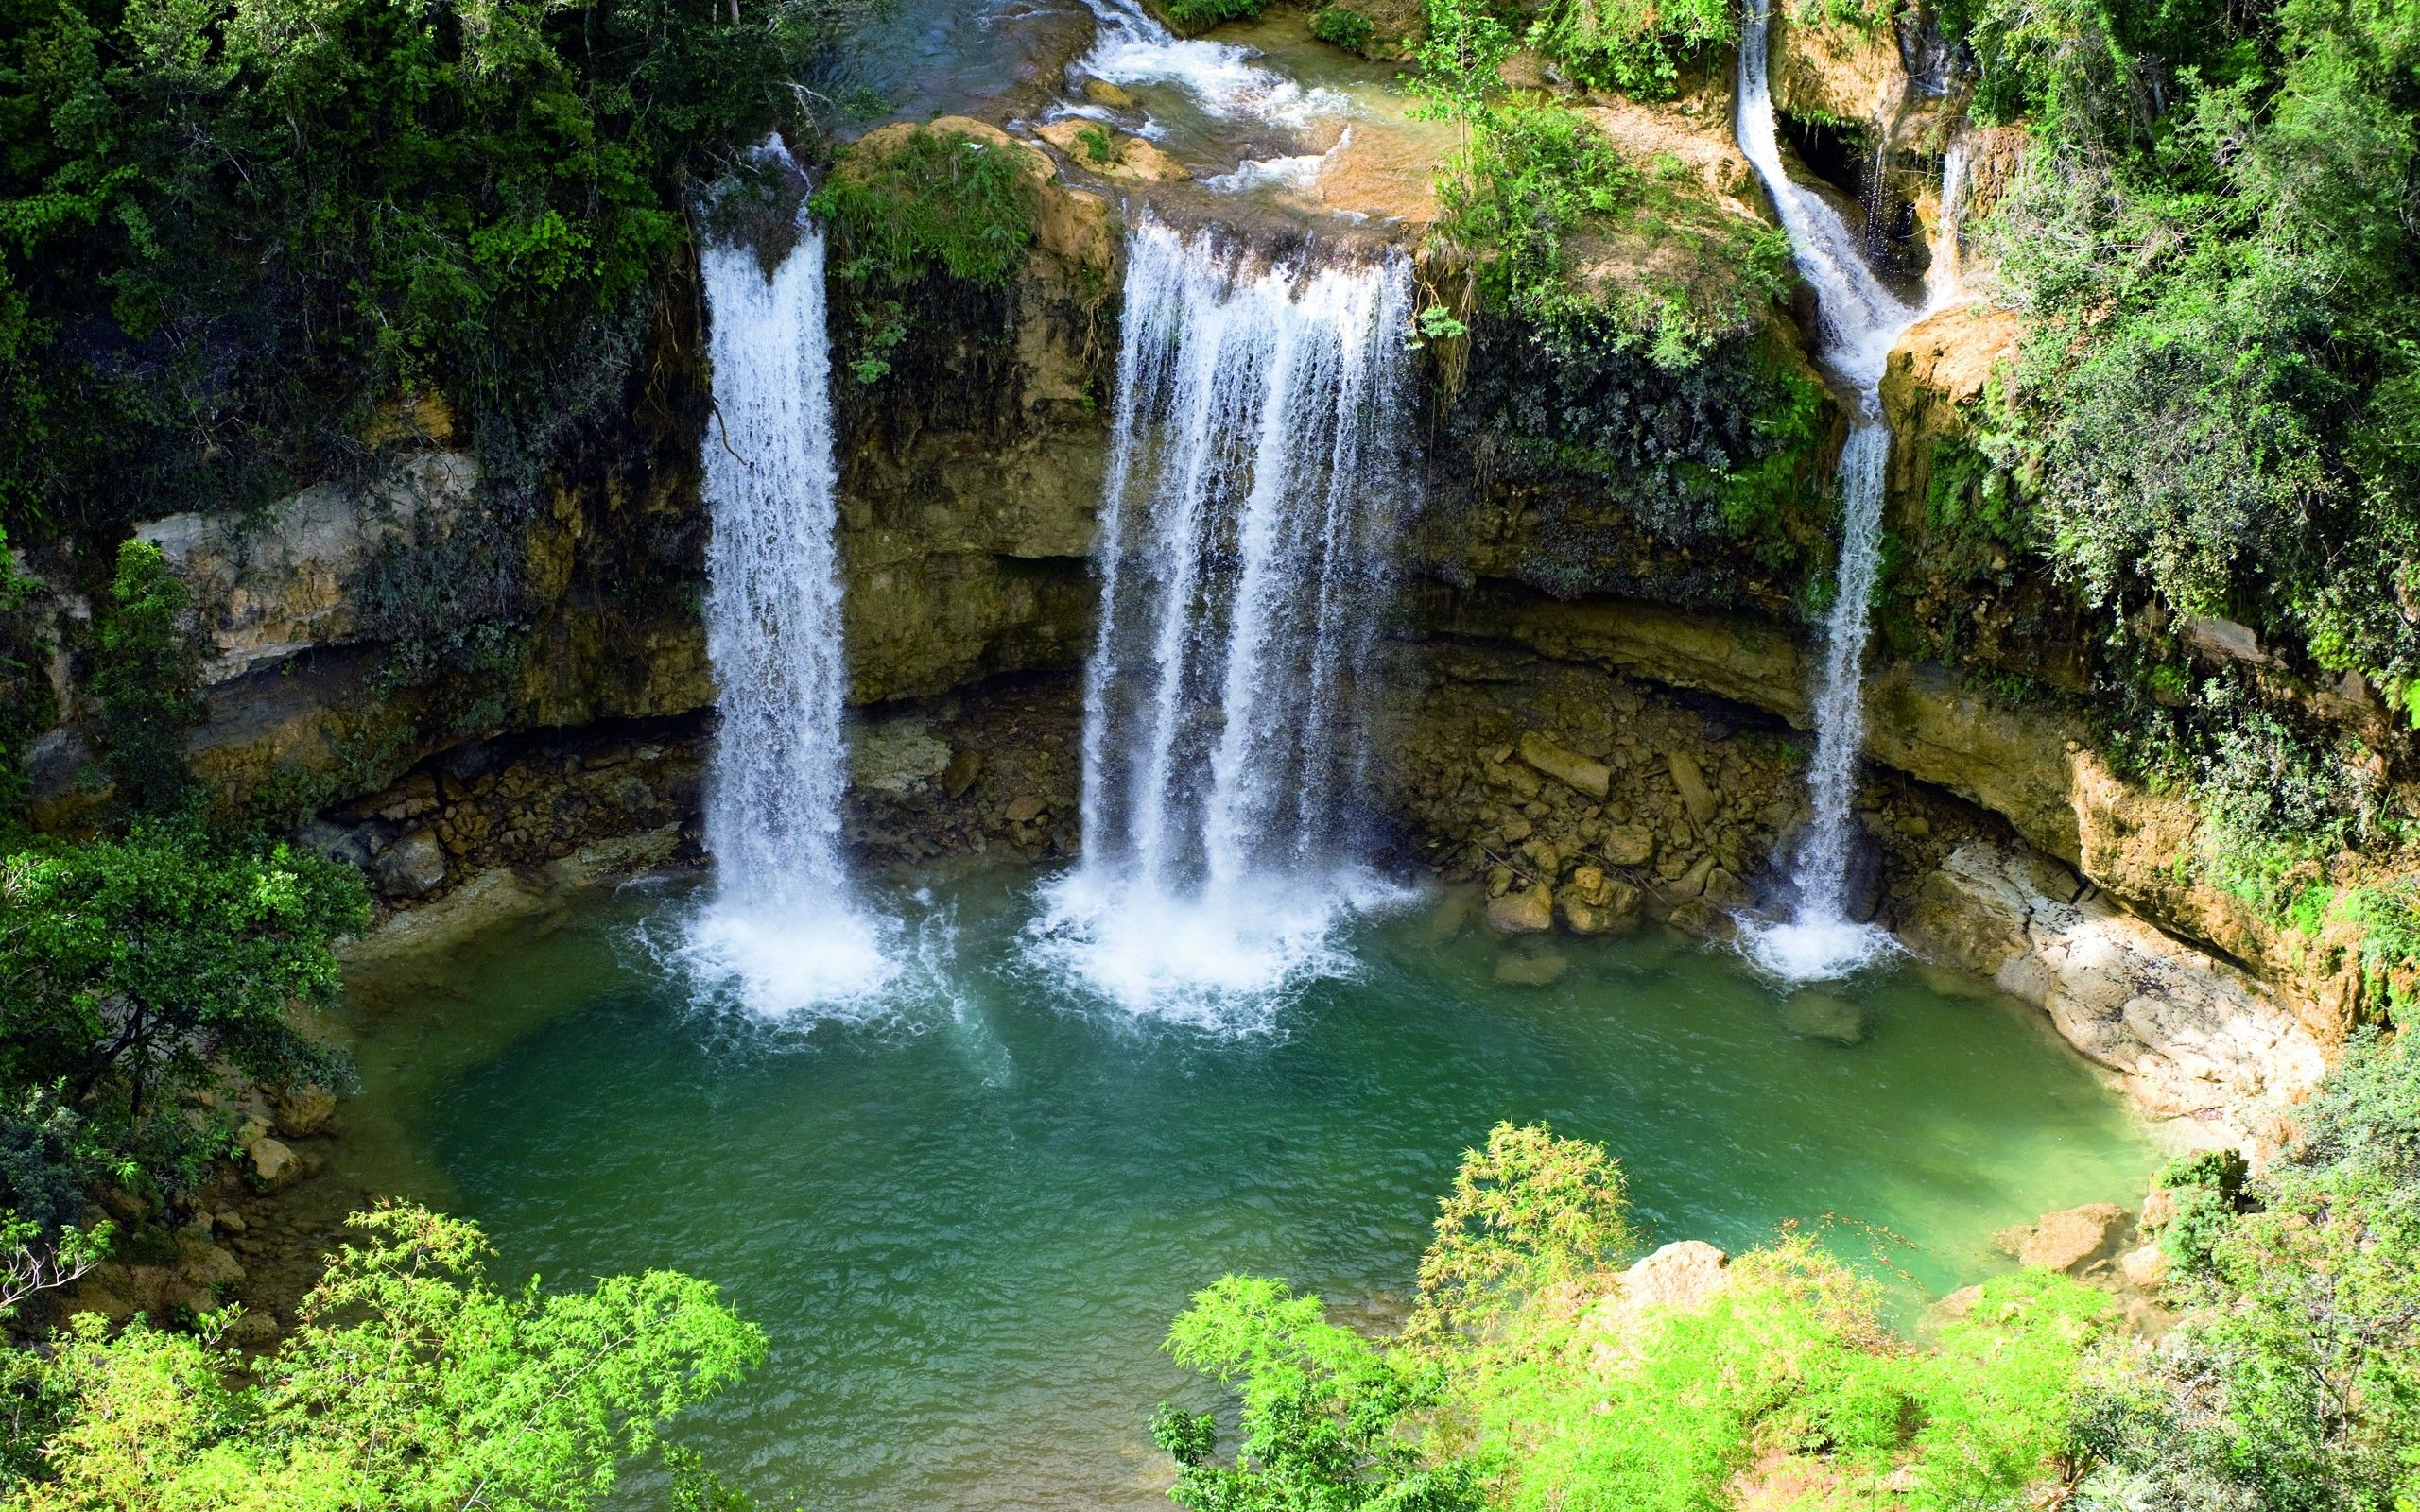 Nature Waterfall Wallpapers Hd Desktop And Mobile Backgrounds Waterfall Wallpaper Natural Waterfalls Waterfall